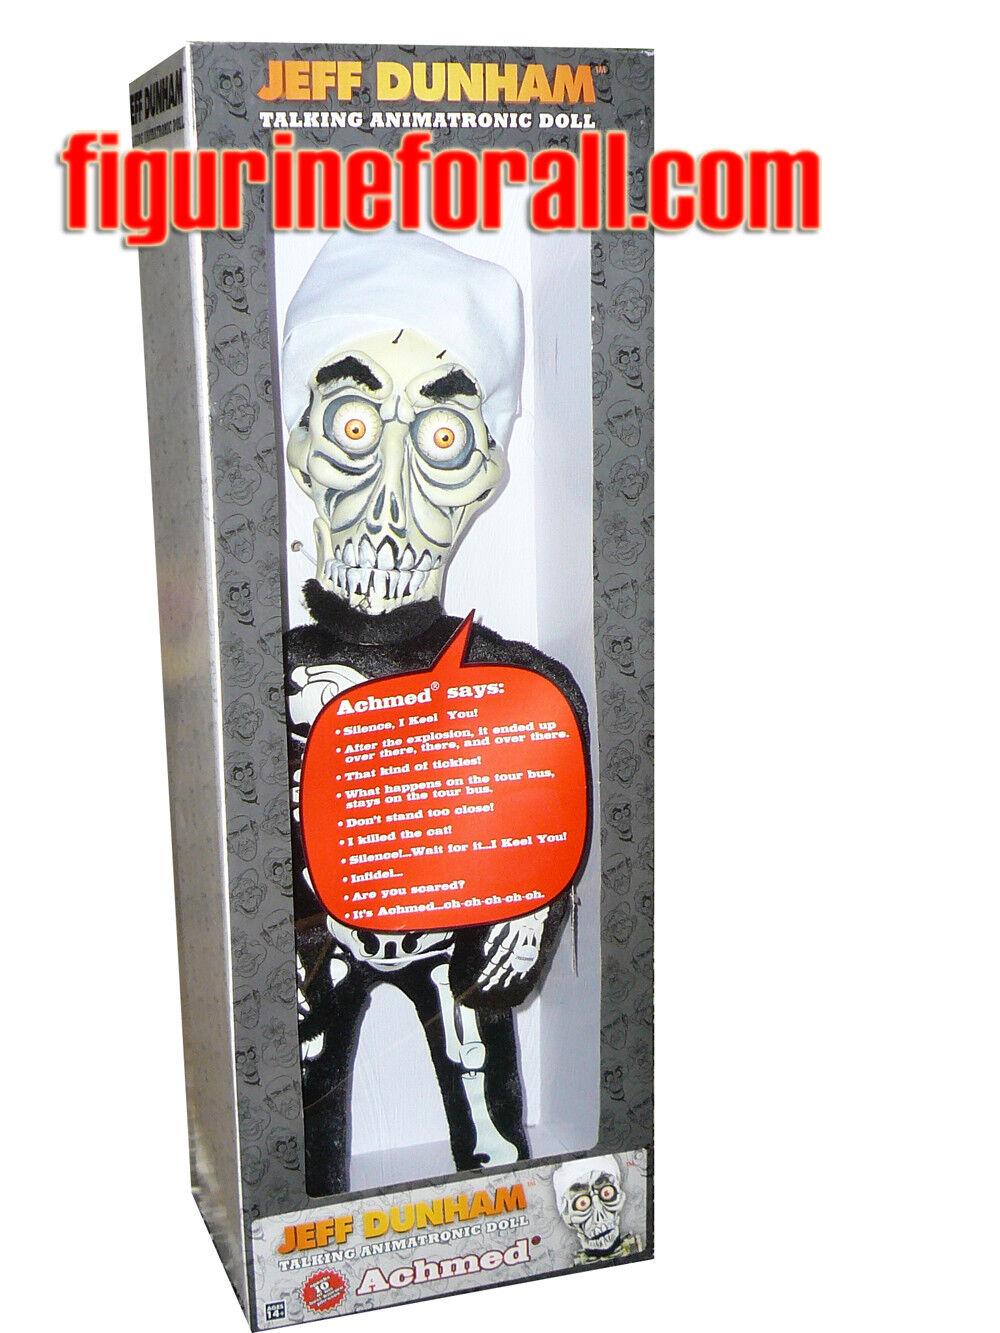 NECA Jeff Dunham Achmed 18  Animatronic hablando Muñeca de Peluche Figura En Stock